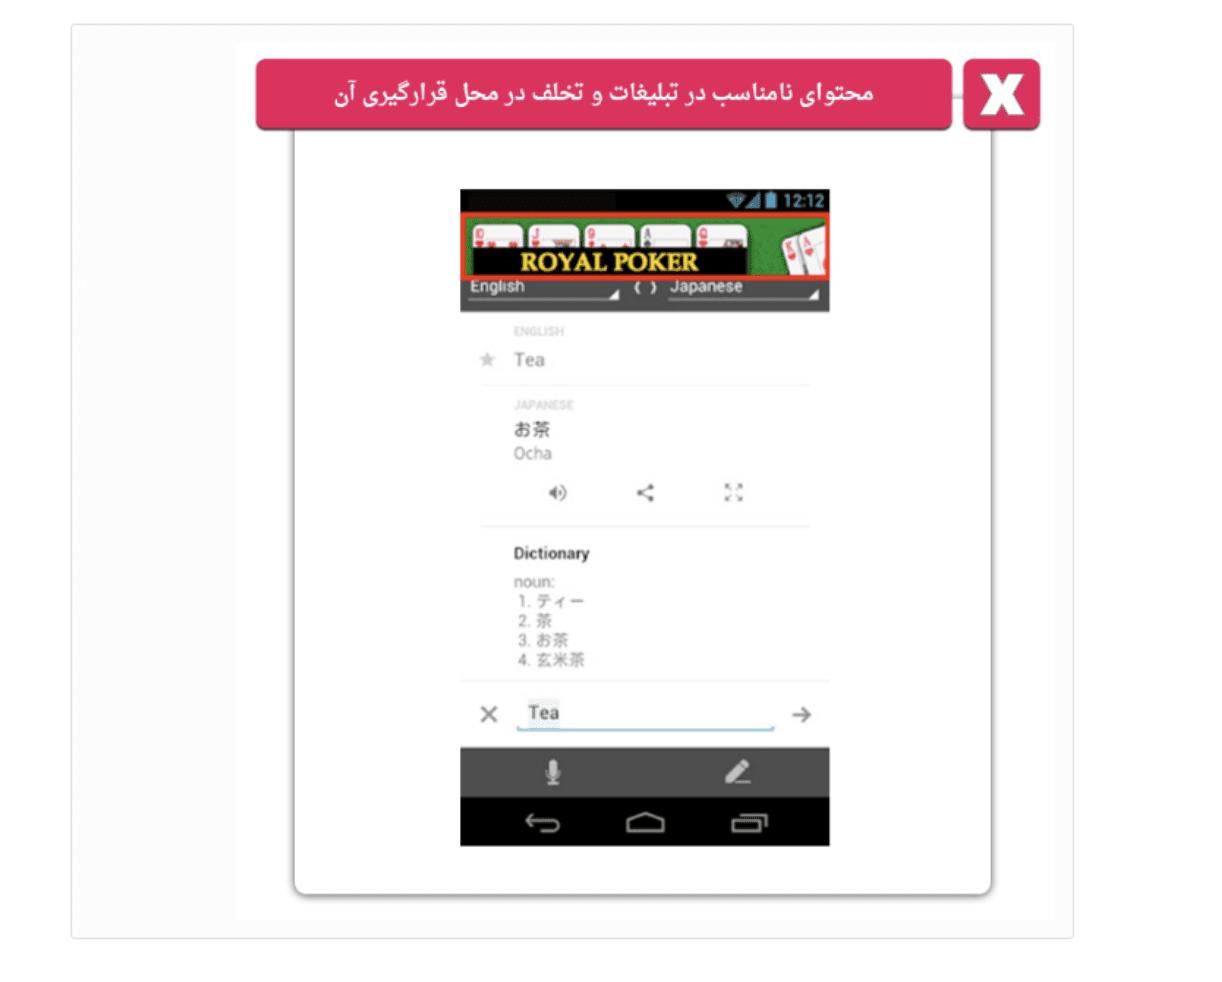 Screen Shot 1399 11 21 at 14.41.57 بازار: ارسال پوش نوتیفیکیشن تبلیغاتی آزاردهنده است اخبار IT